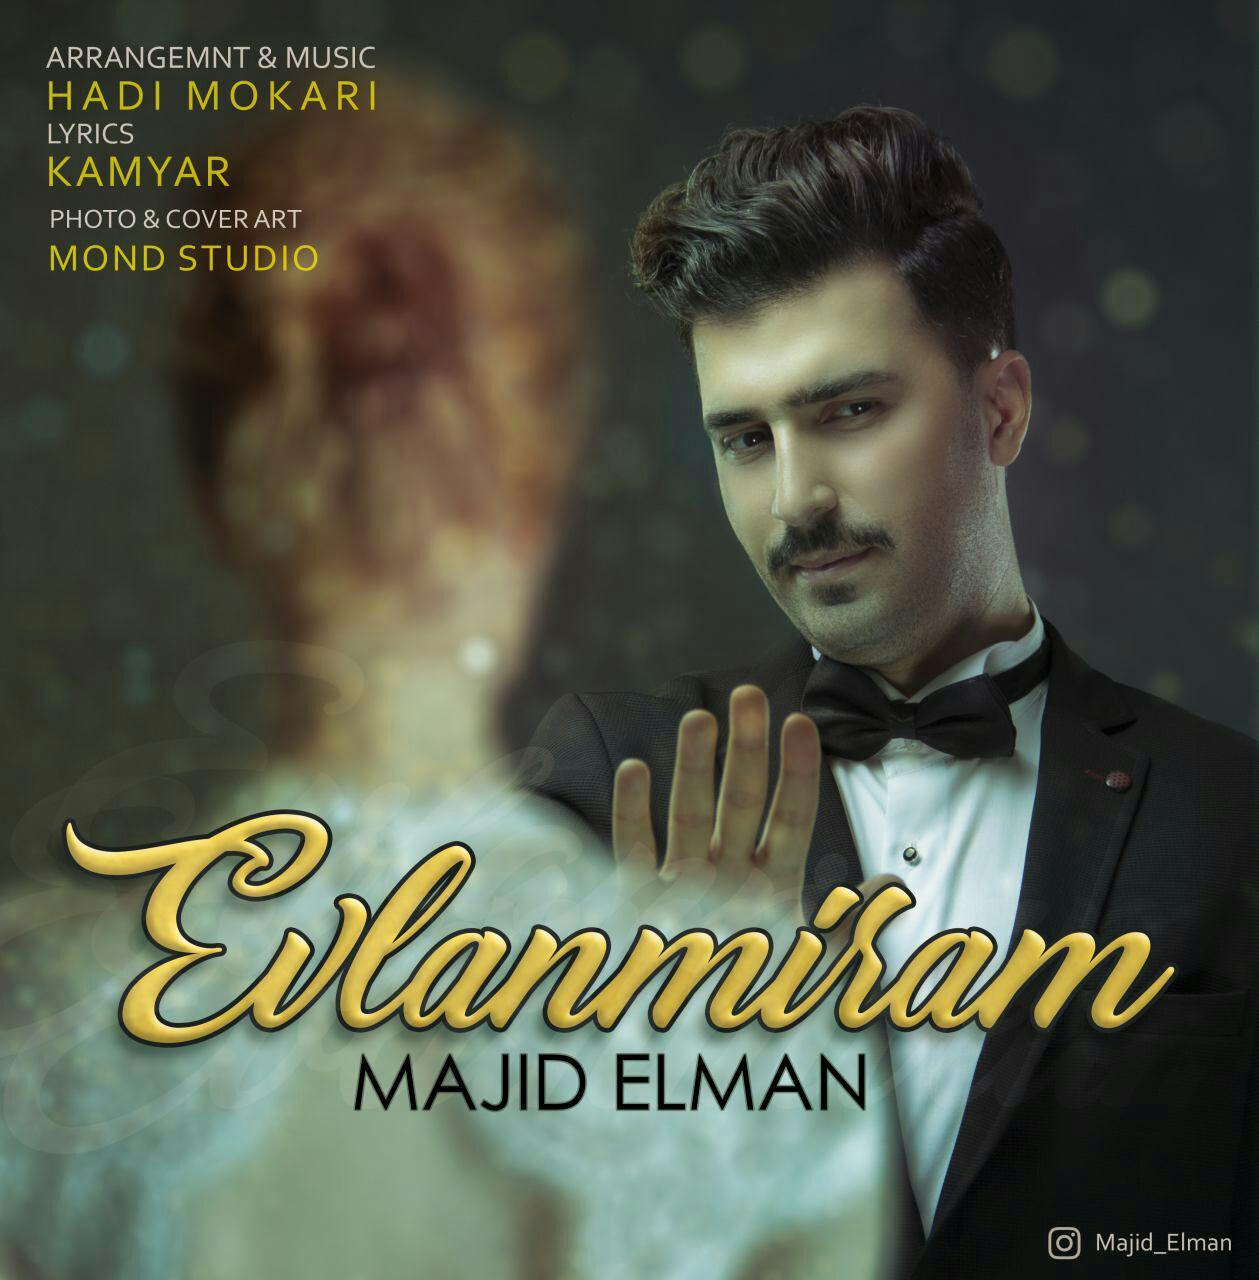 http://s9.picofile.com/file/8299410618/153Majid_Elman_Evlanmiram.jpg